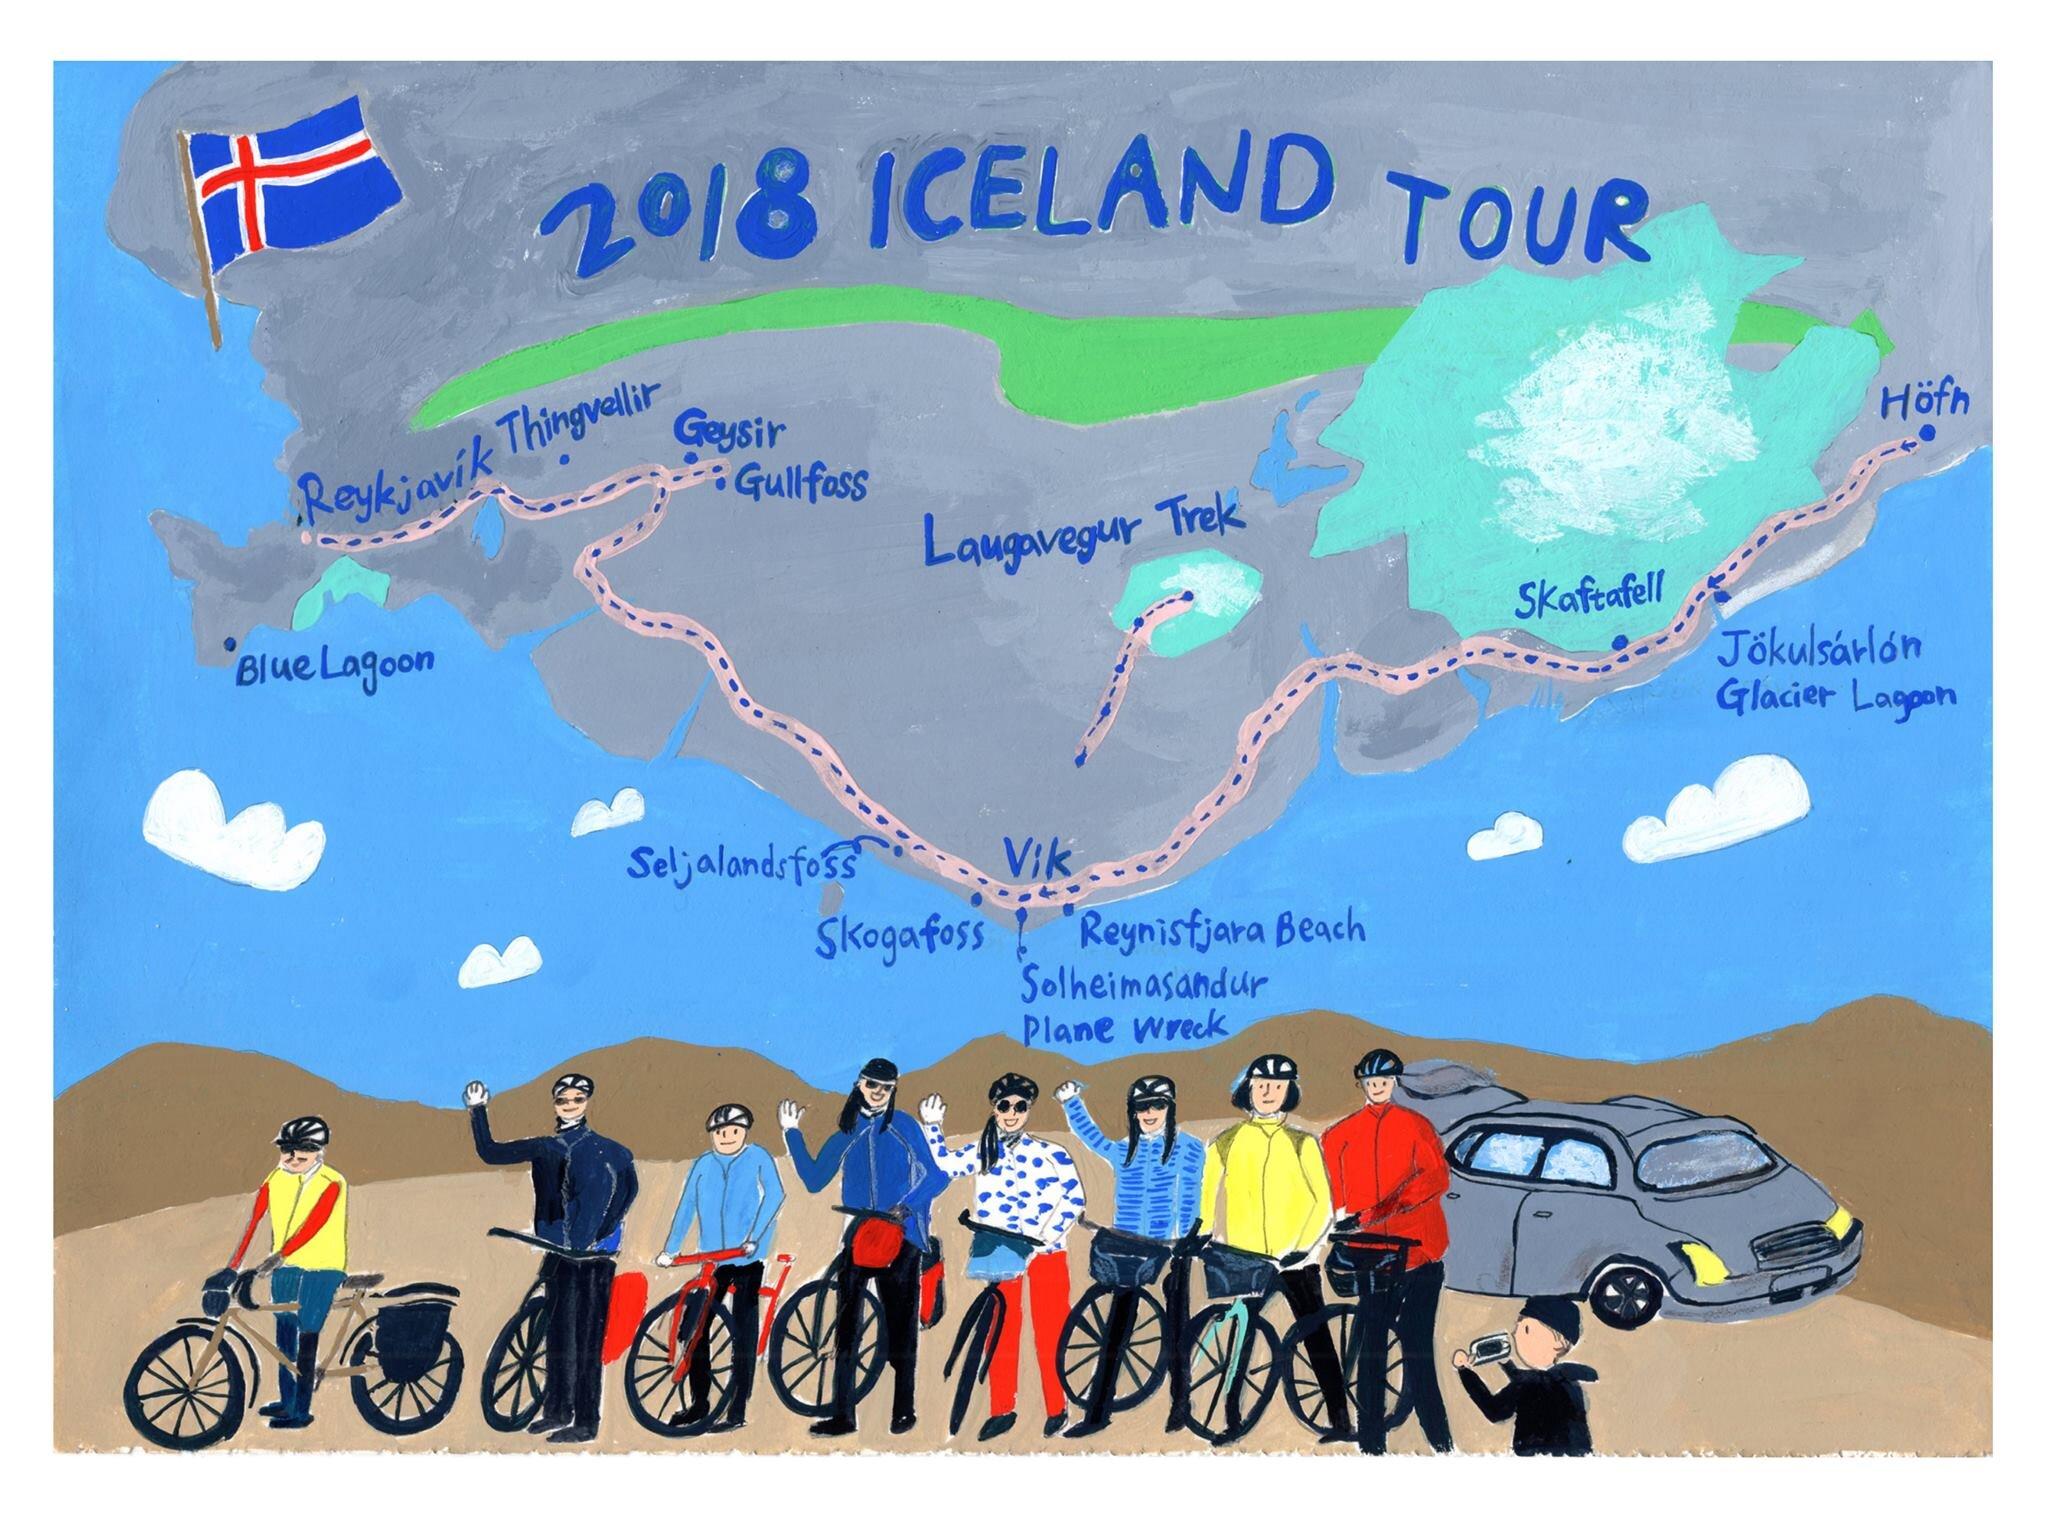 Jessie x Alashi Cycling Illustration以插畫紀錄騎單車旅行世界各地的樣貌 l 誠品R79小誌市集.jpg